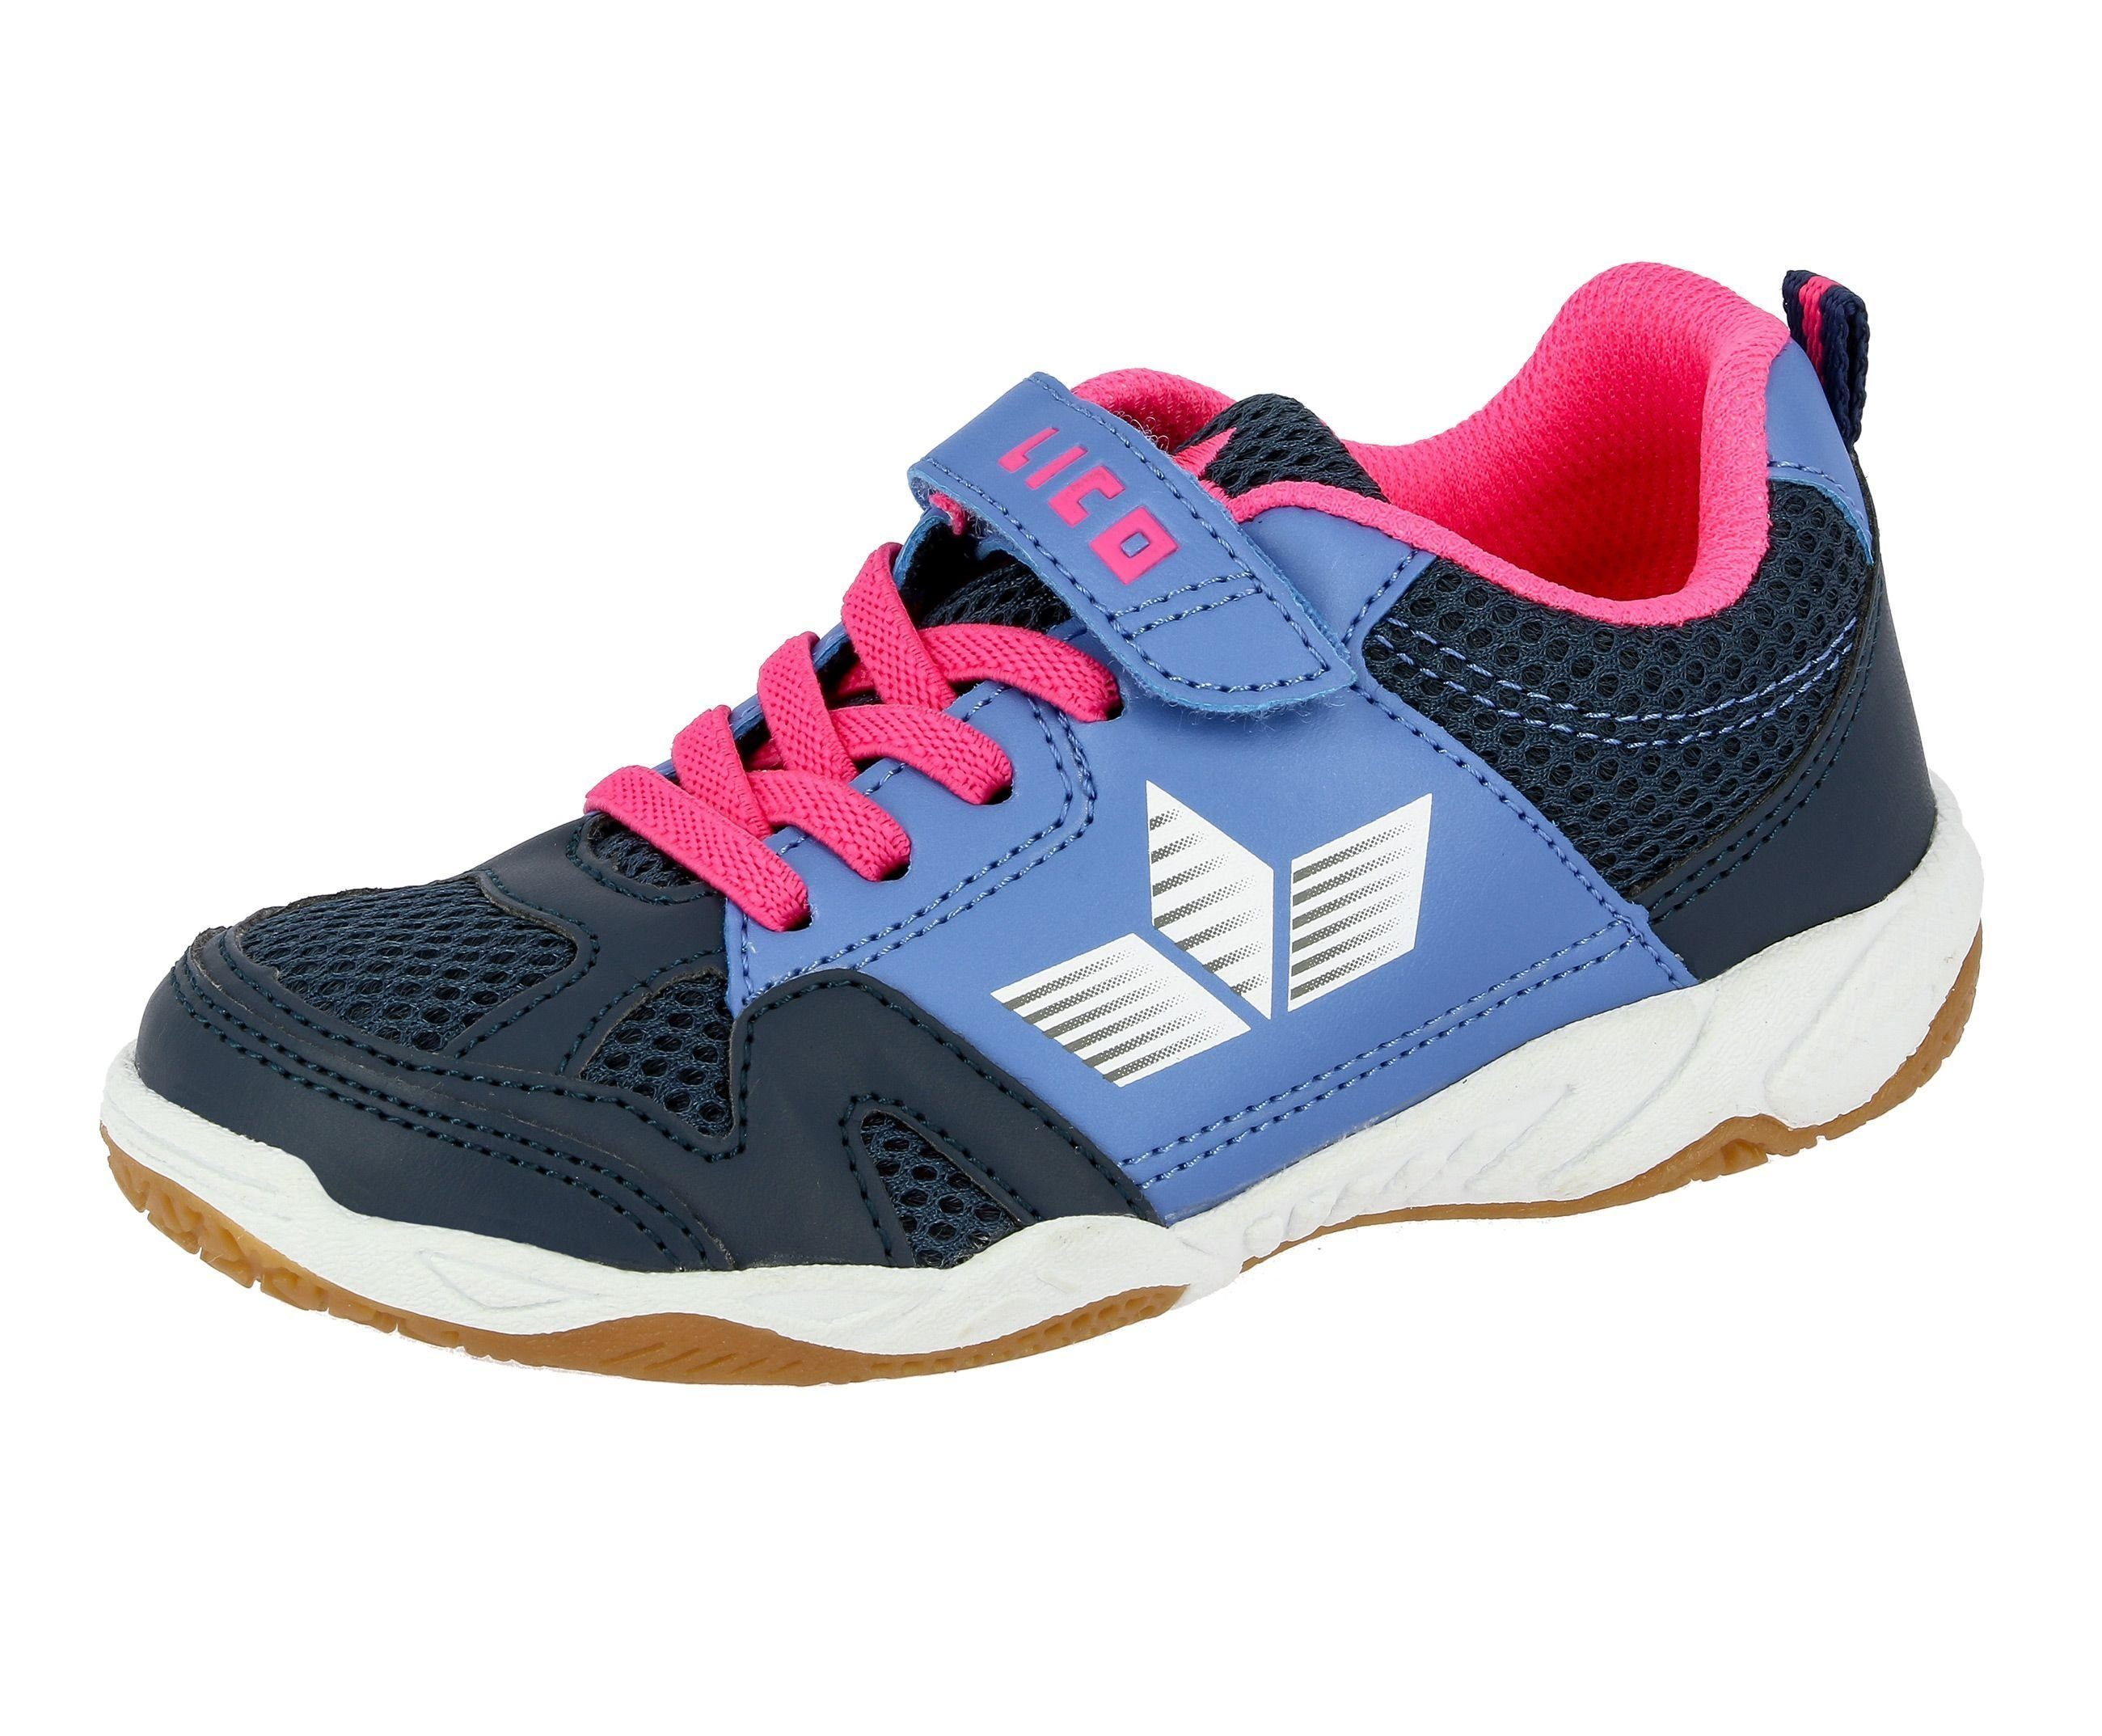 DIADORA Flexi Trainer 2 Youth Unisex Cross Training Shoes